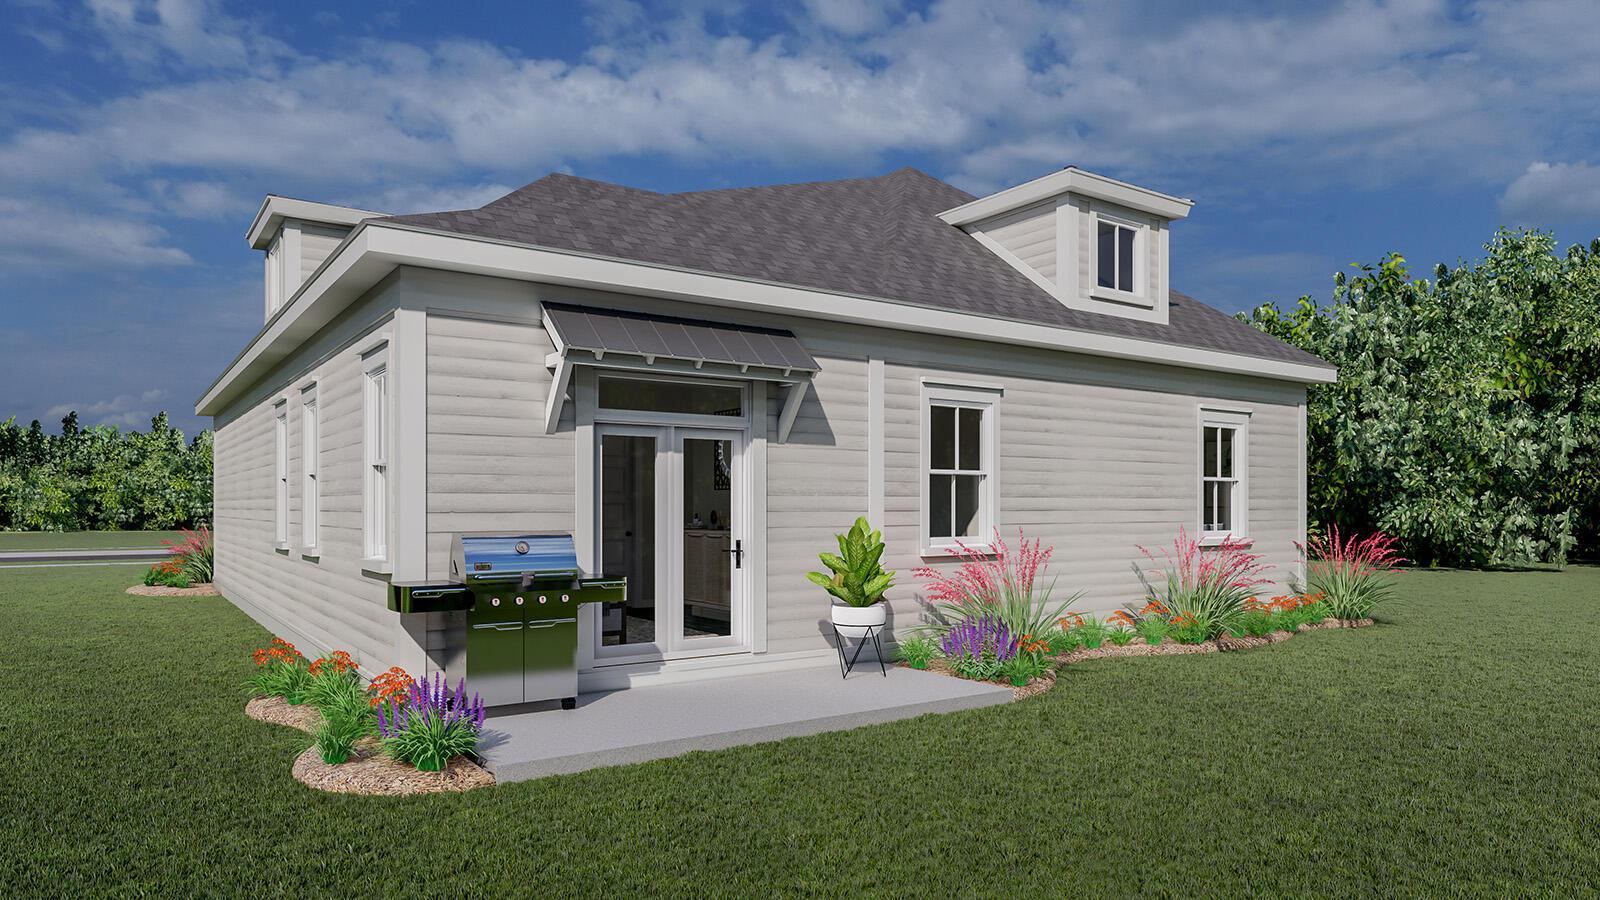 Carolina Park Homes For Sale - 3499 Habernaria, Mount Pleasant, SC - 8